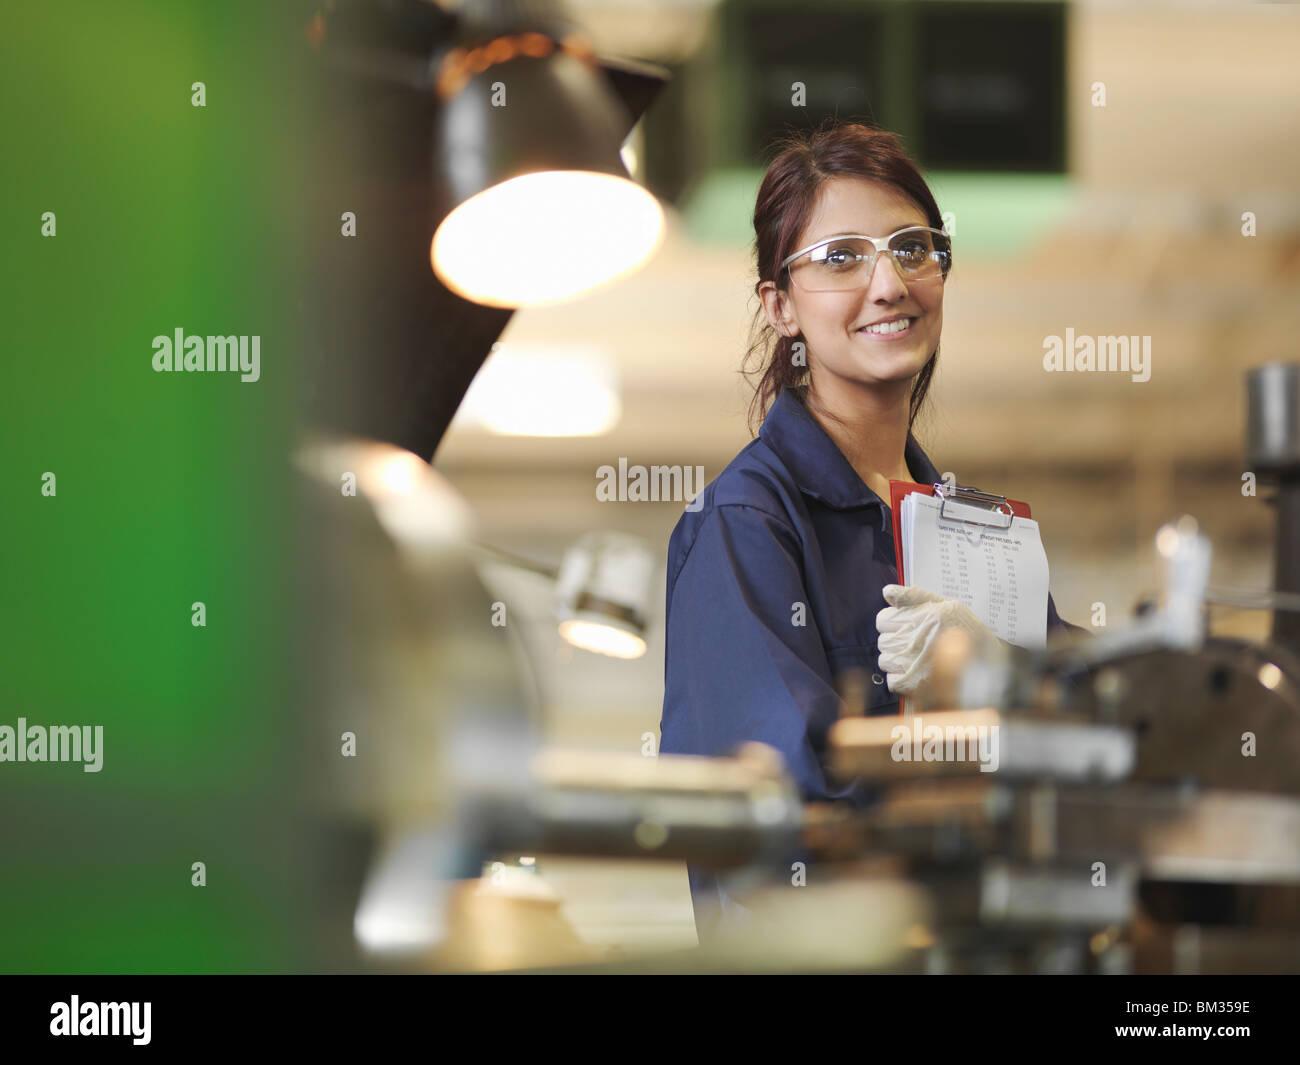 Female Apprentice With Clipboard Stock Photo